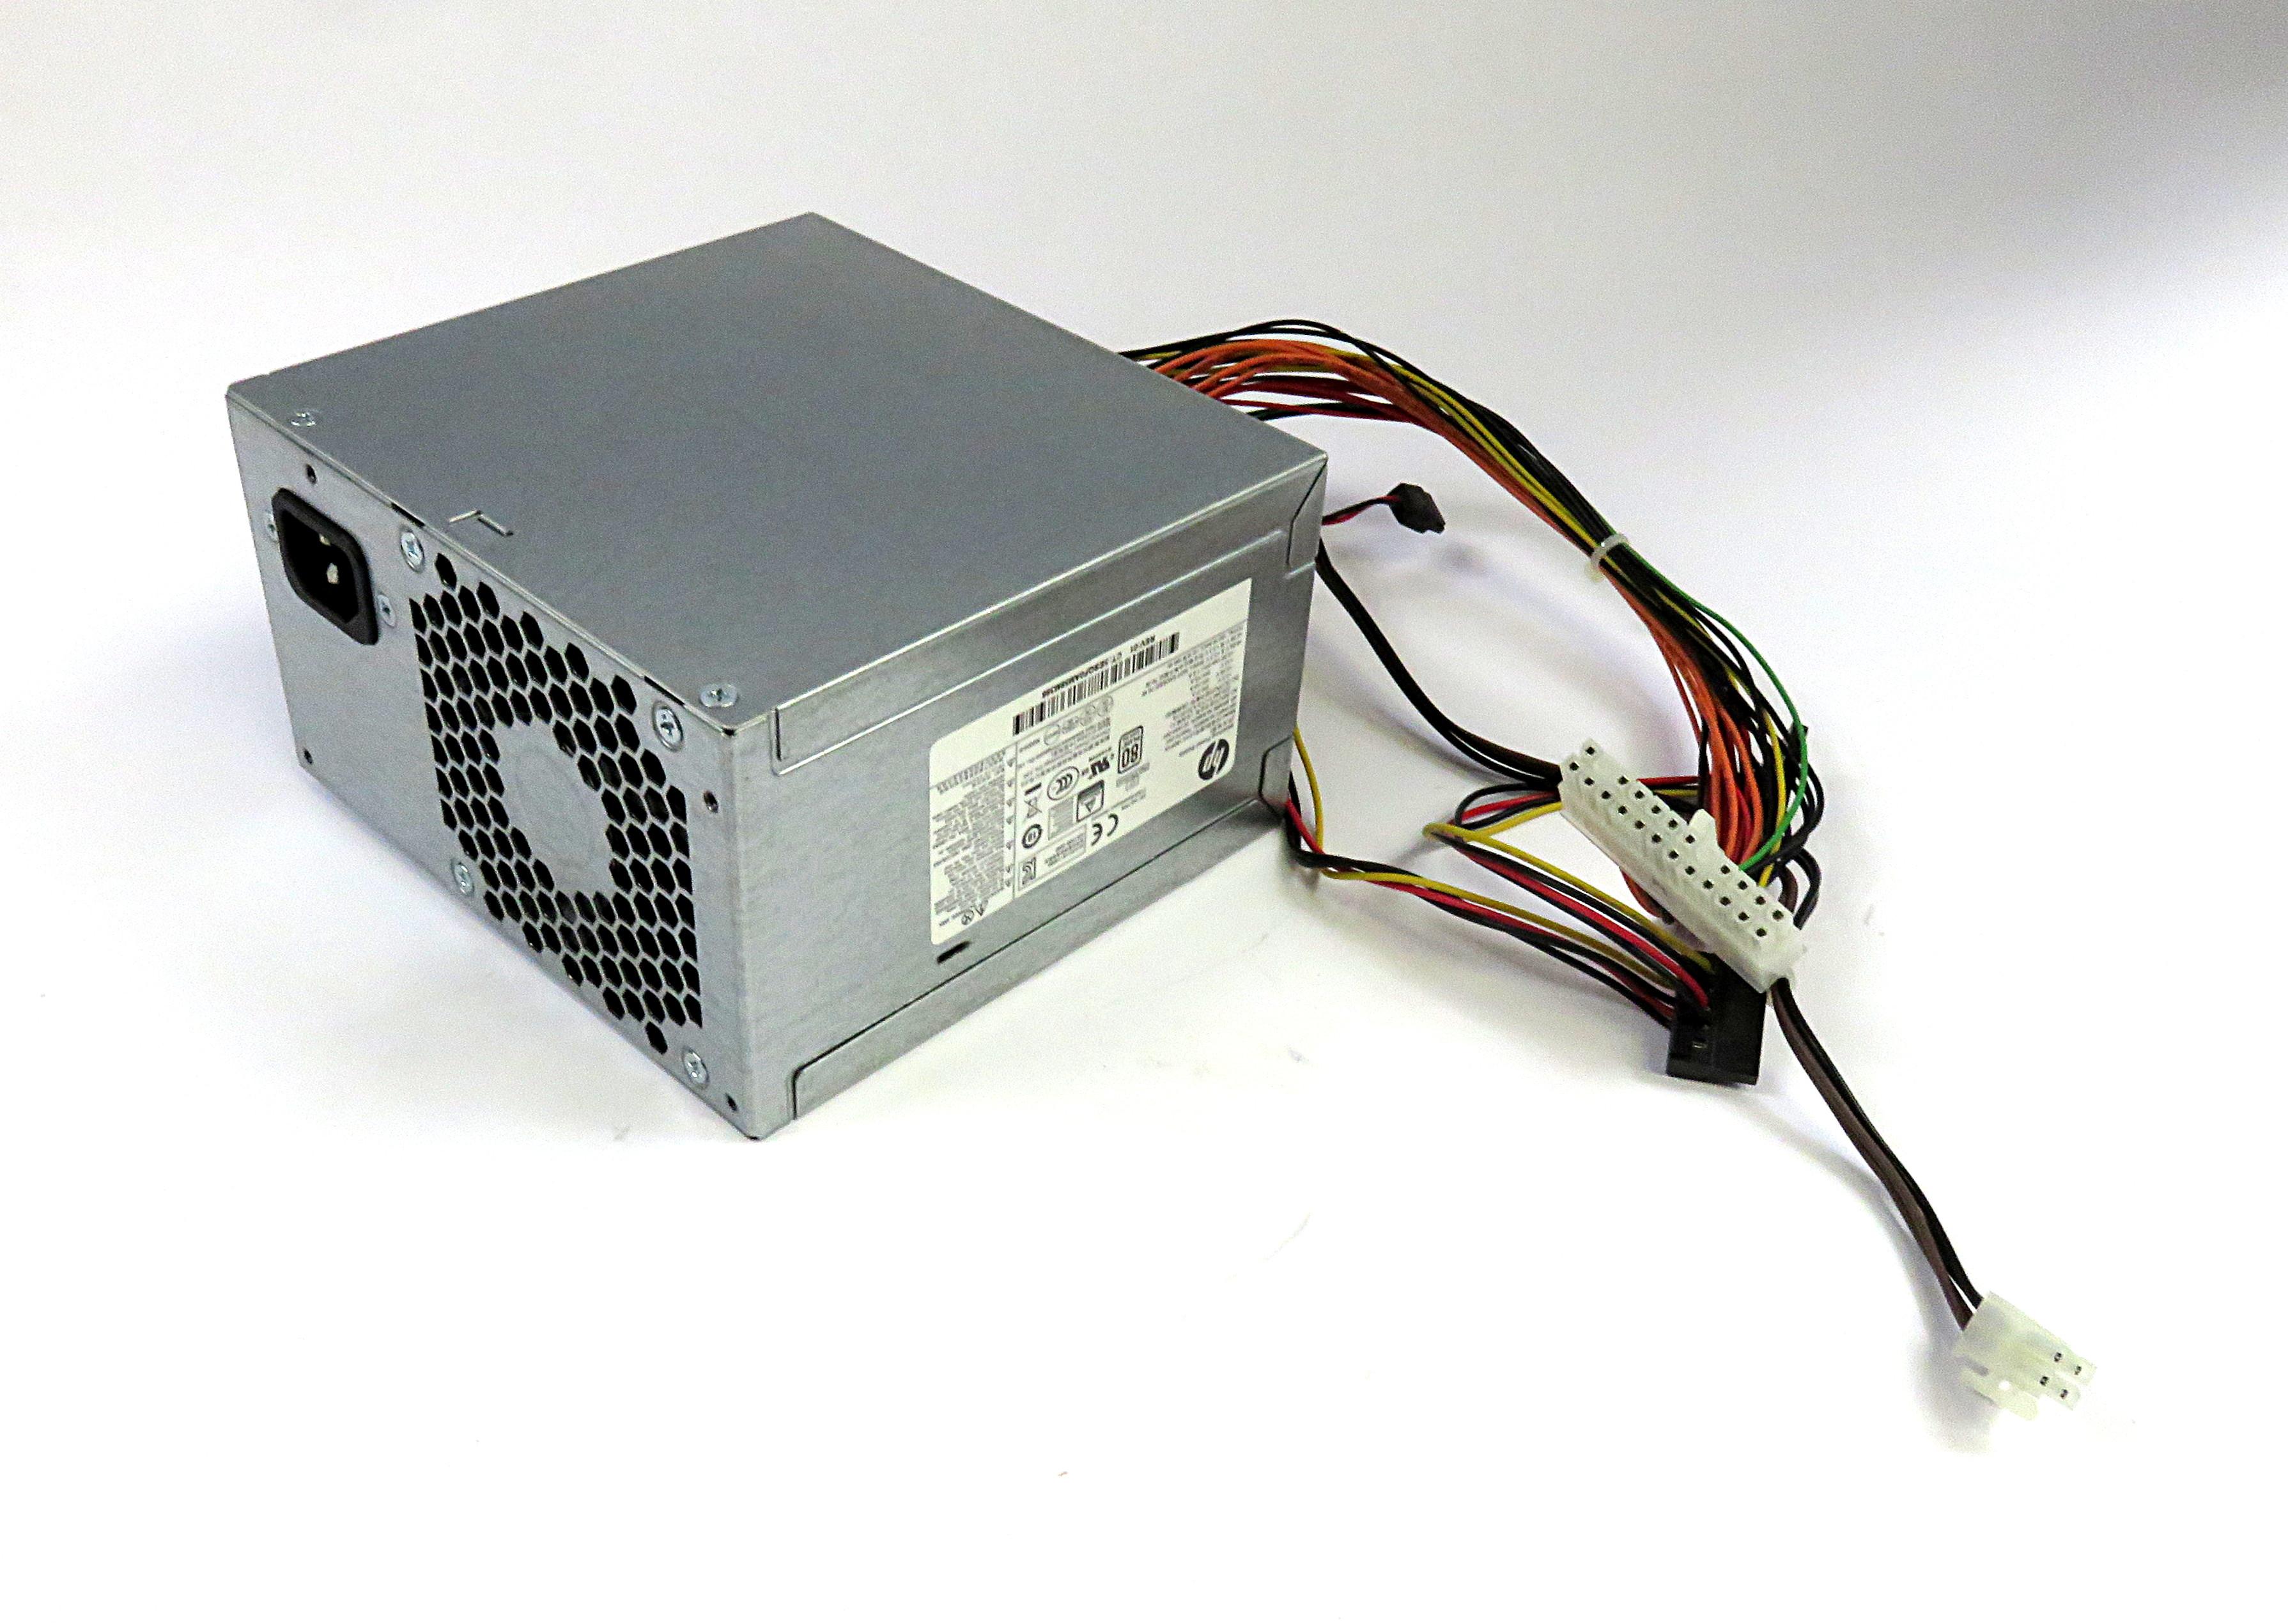 794974-001 801550-001 HP 180W Chicony D14-180P1A PSU /f B&O Pavilion Desktop PC